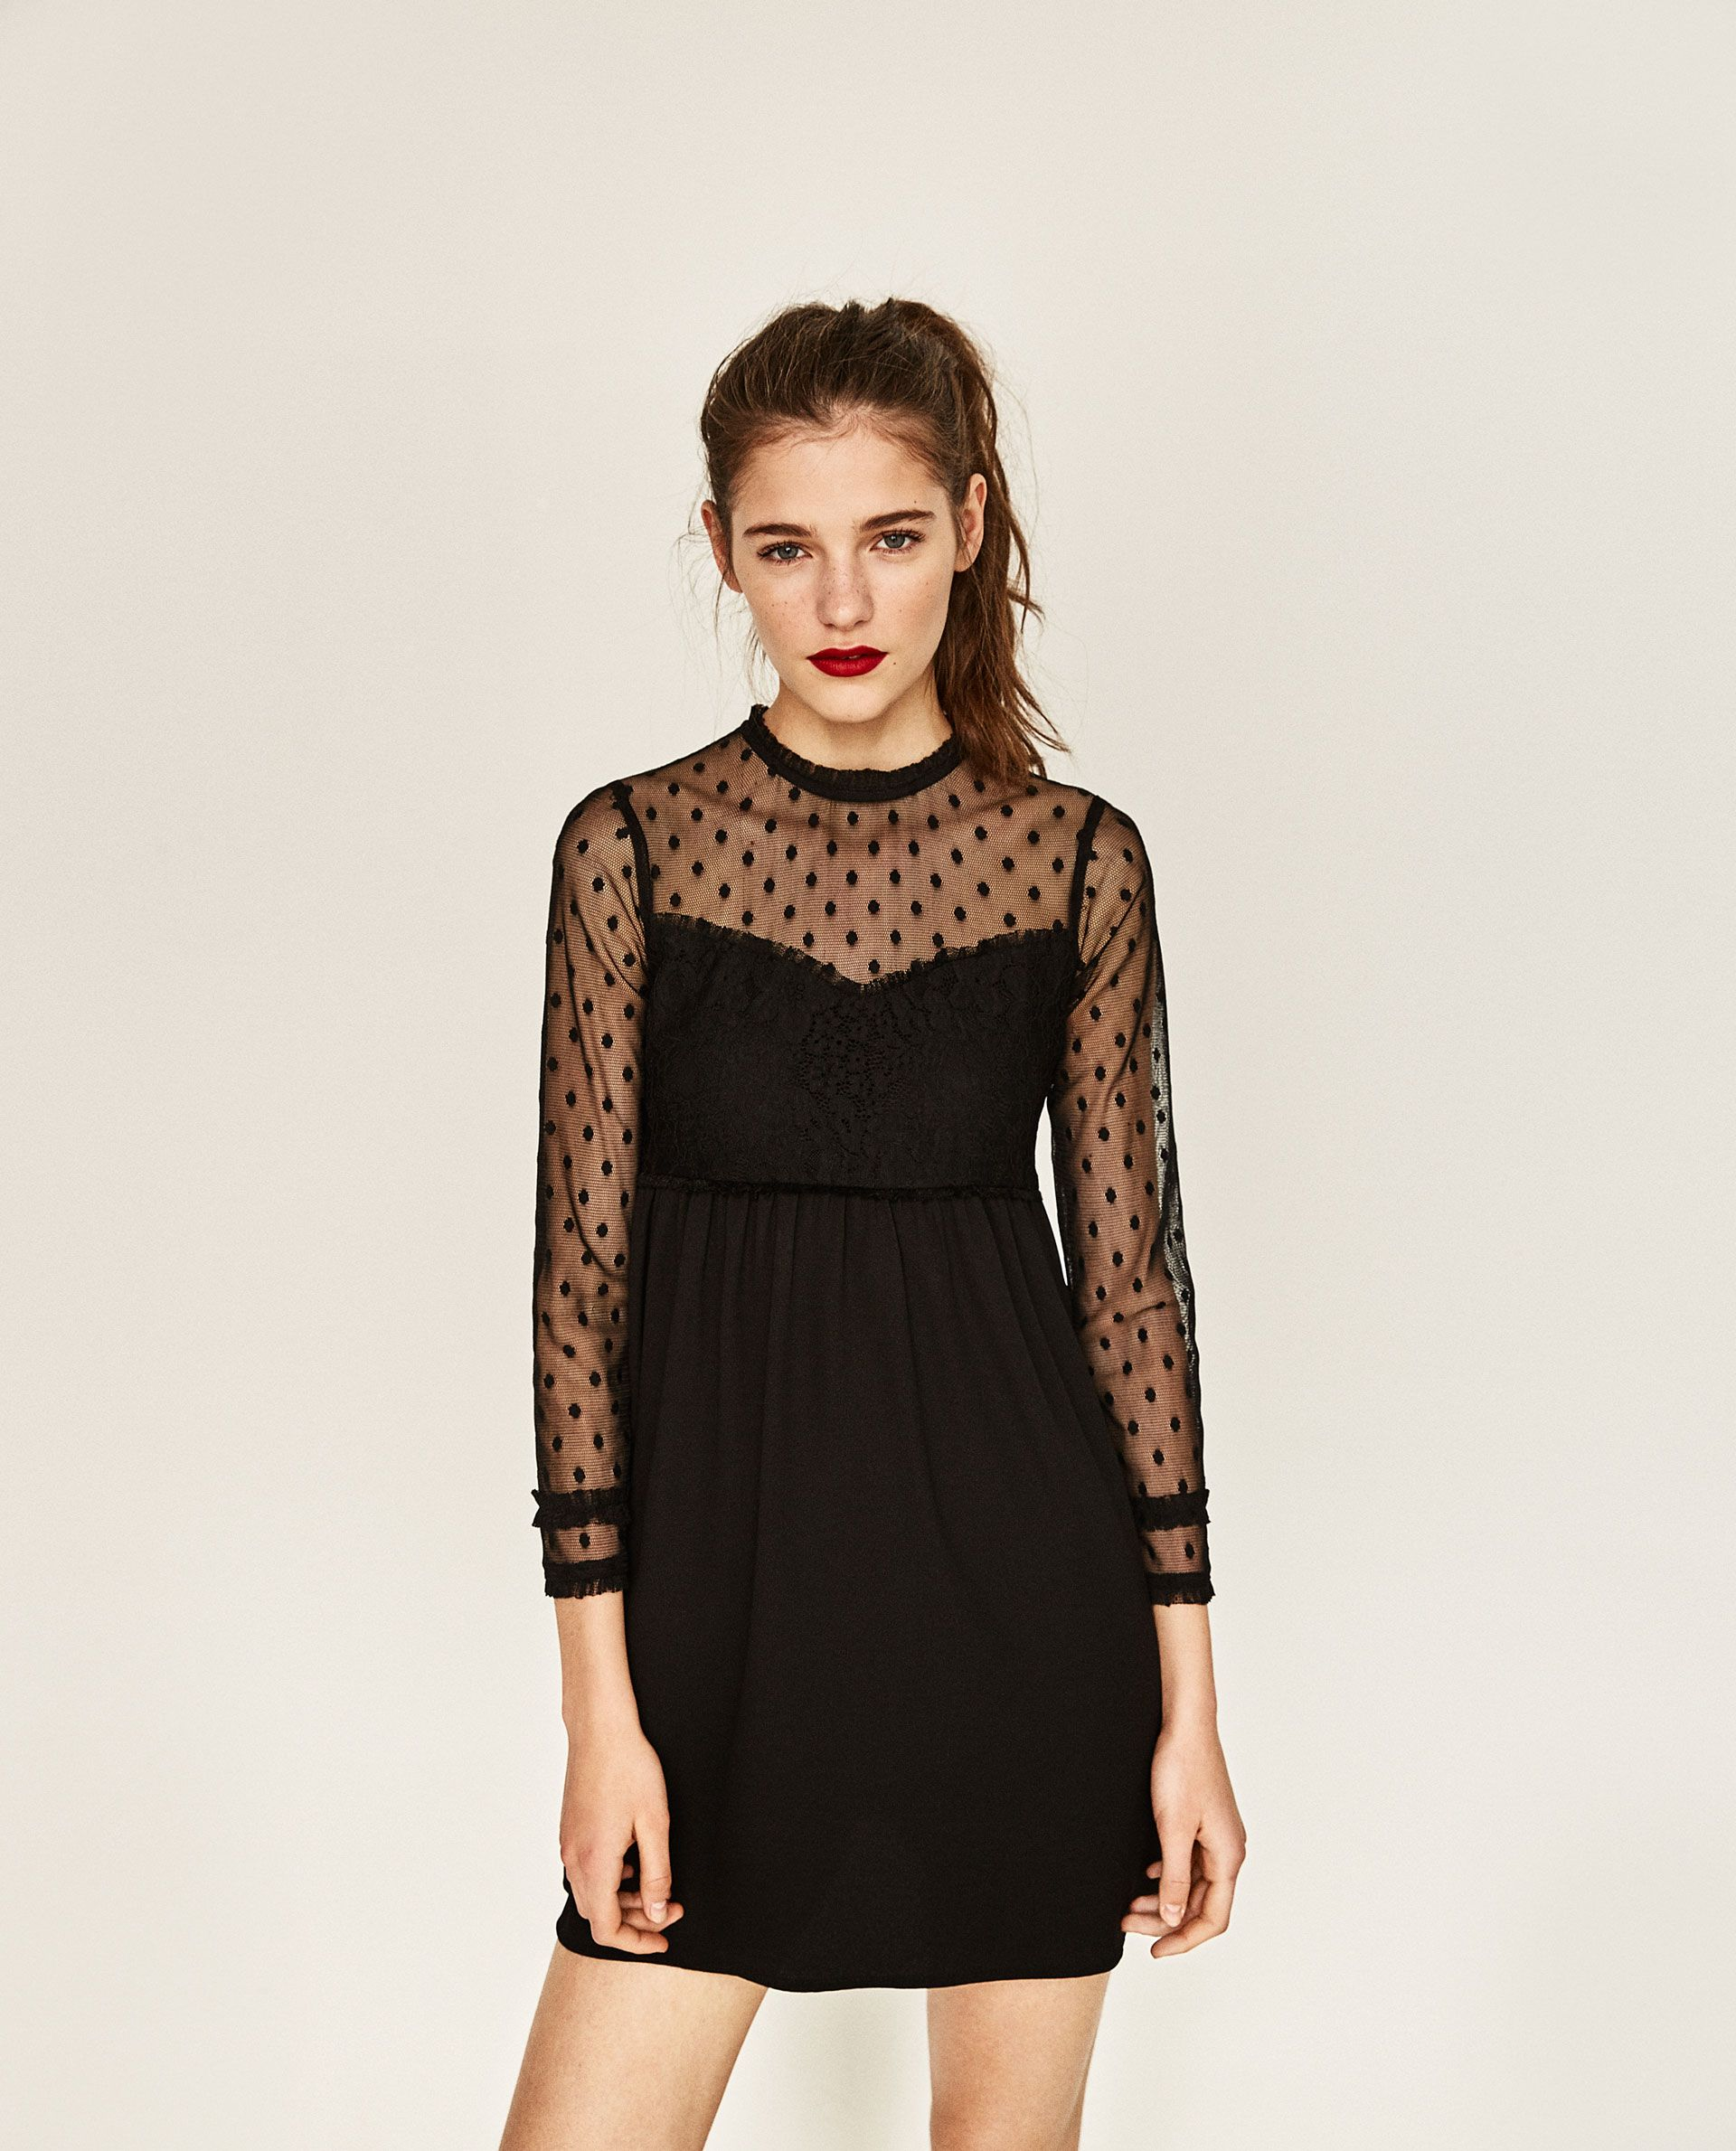 Contrast Fabric Lace Dress Lace Dress Lace Panel Dress Black Sheer Dress [ 2379 x 1920 Pixel ]